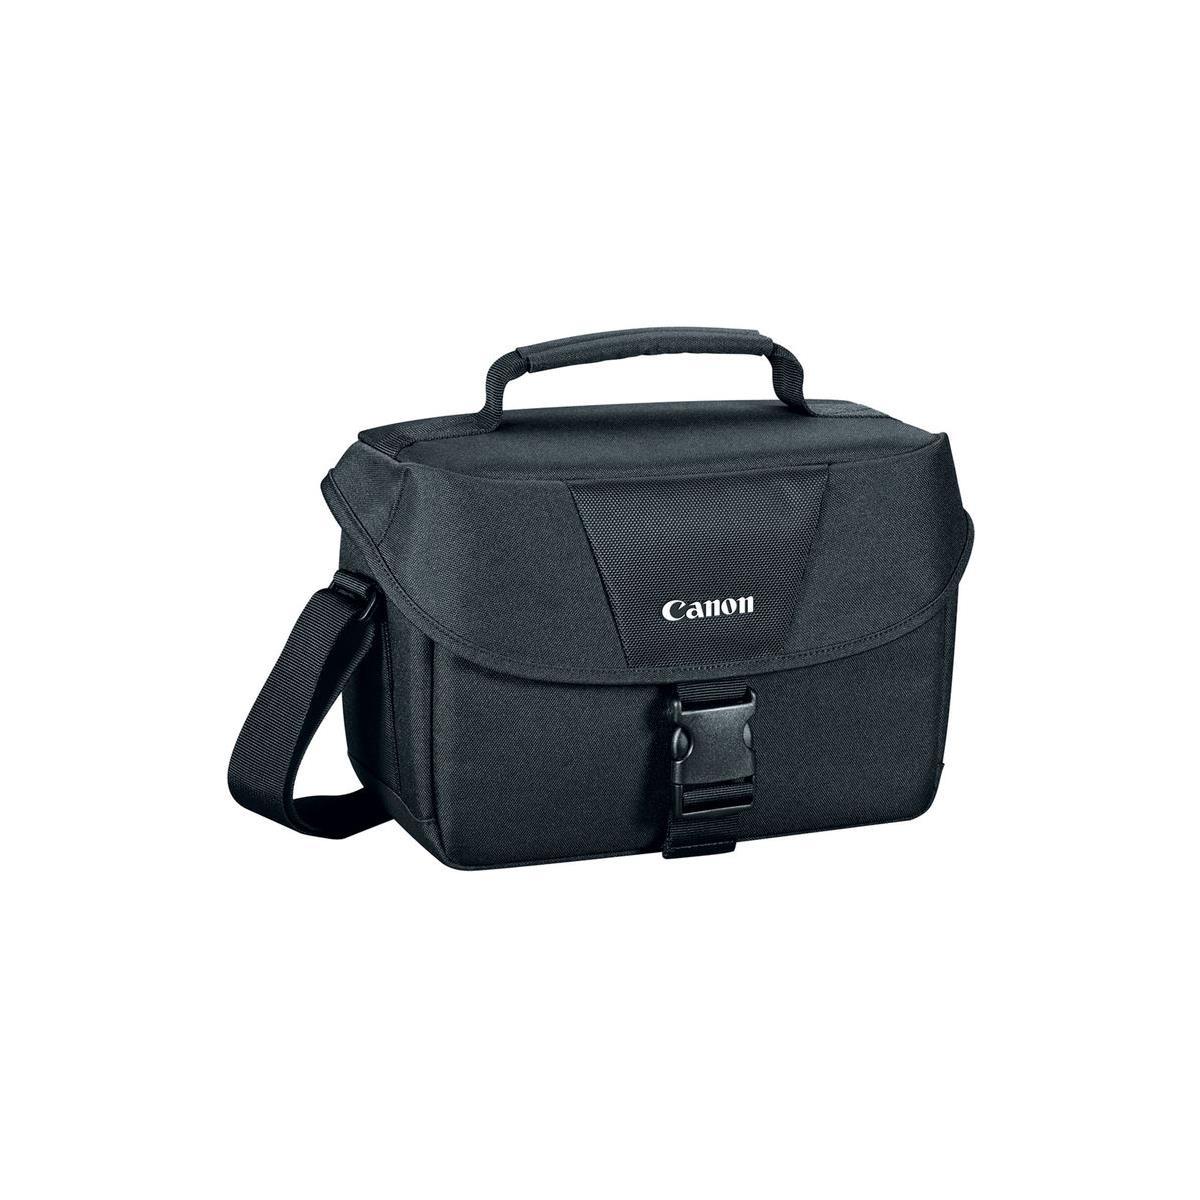 Canon 100ES Shoulder Bag (Black)  $10 + Free S/H